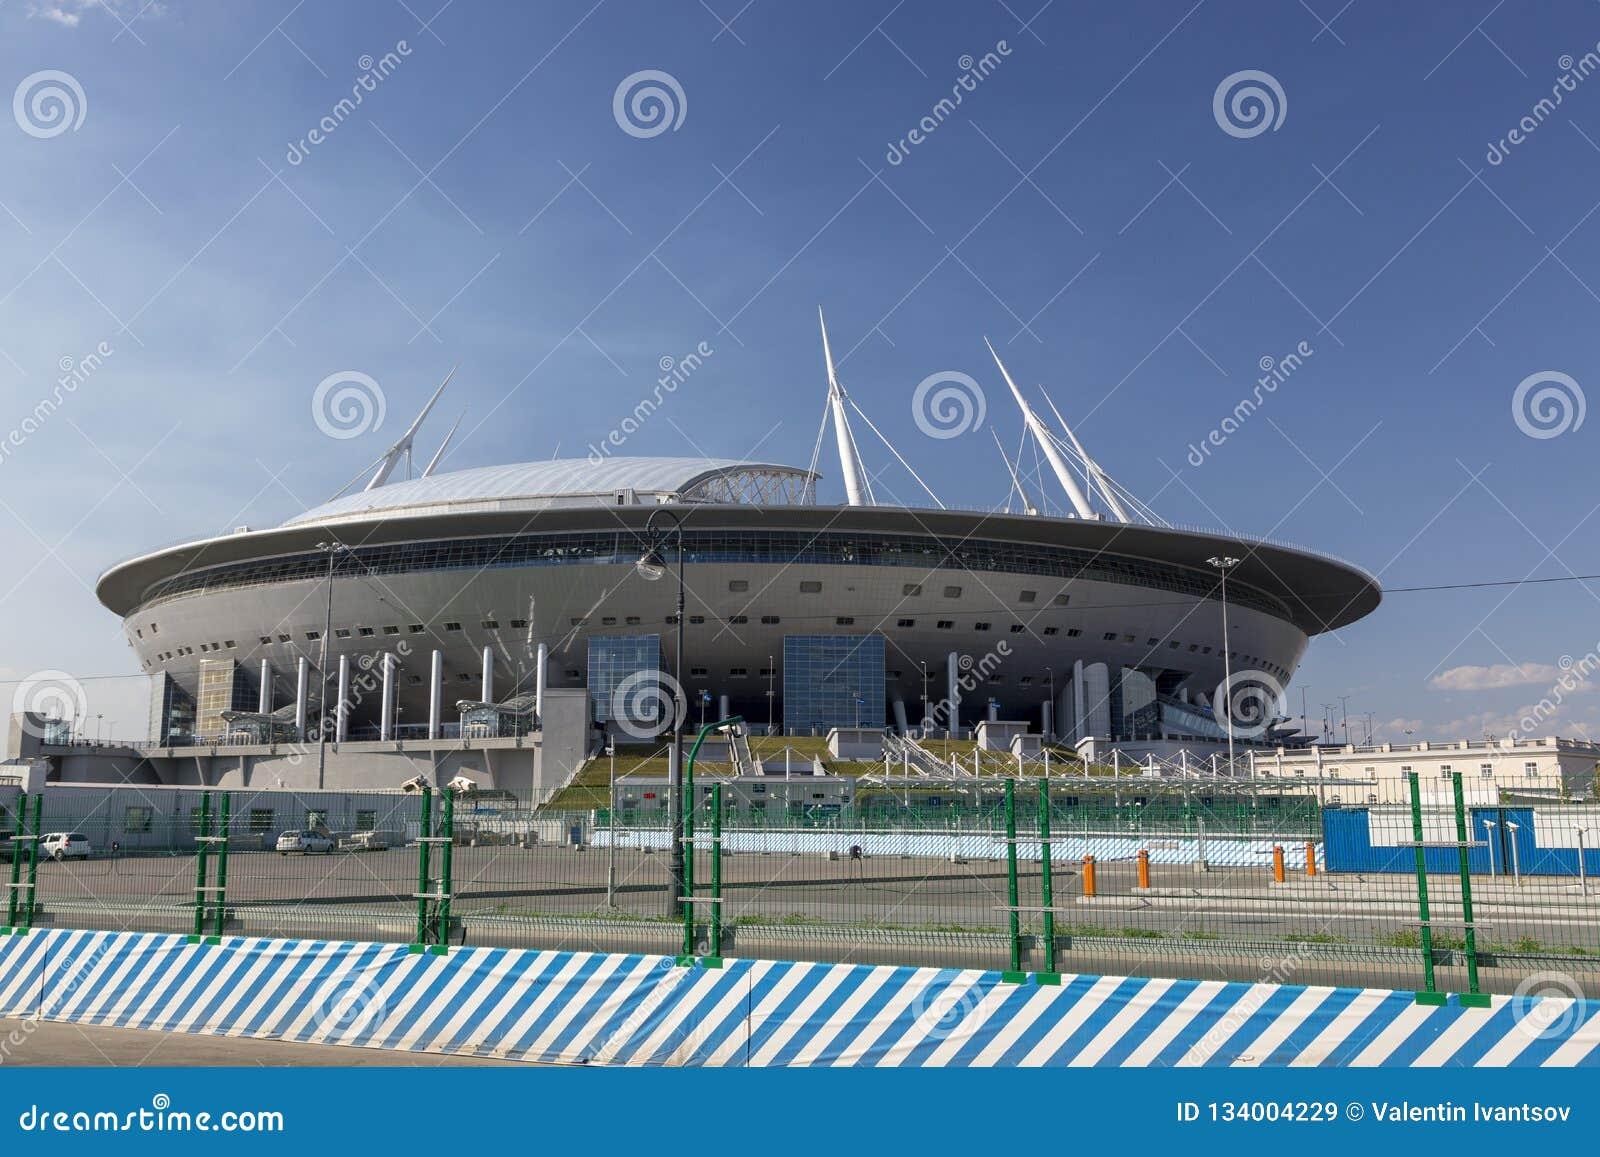 Gazprom Sport